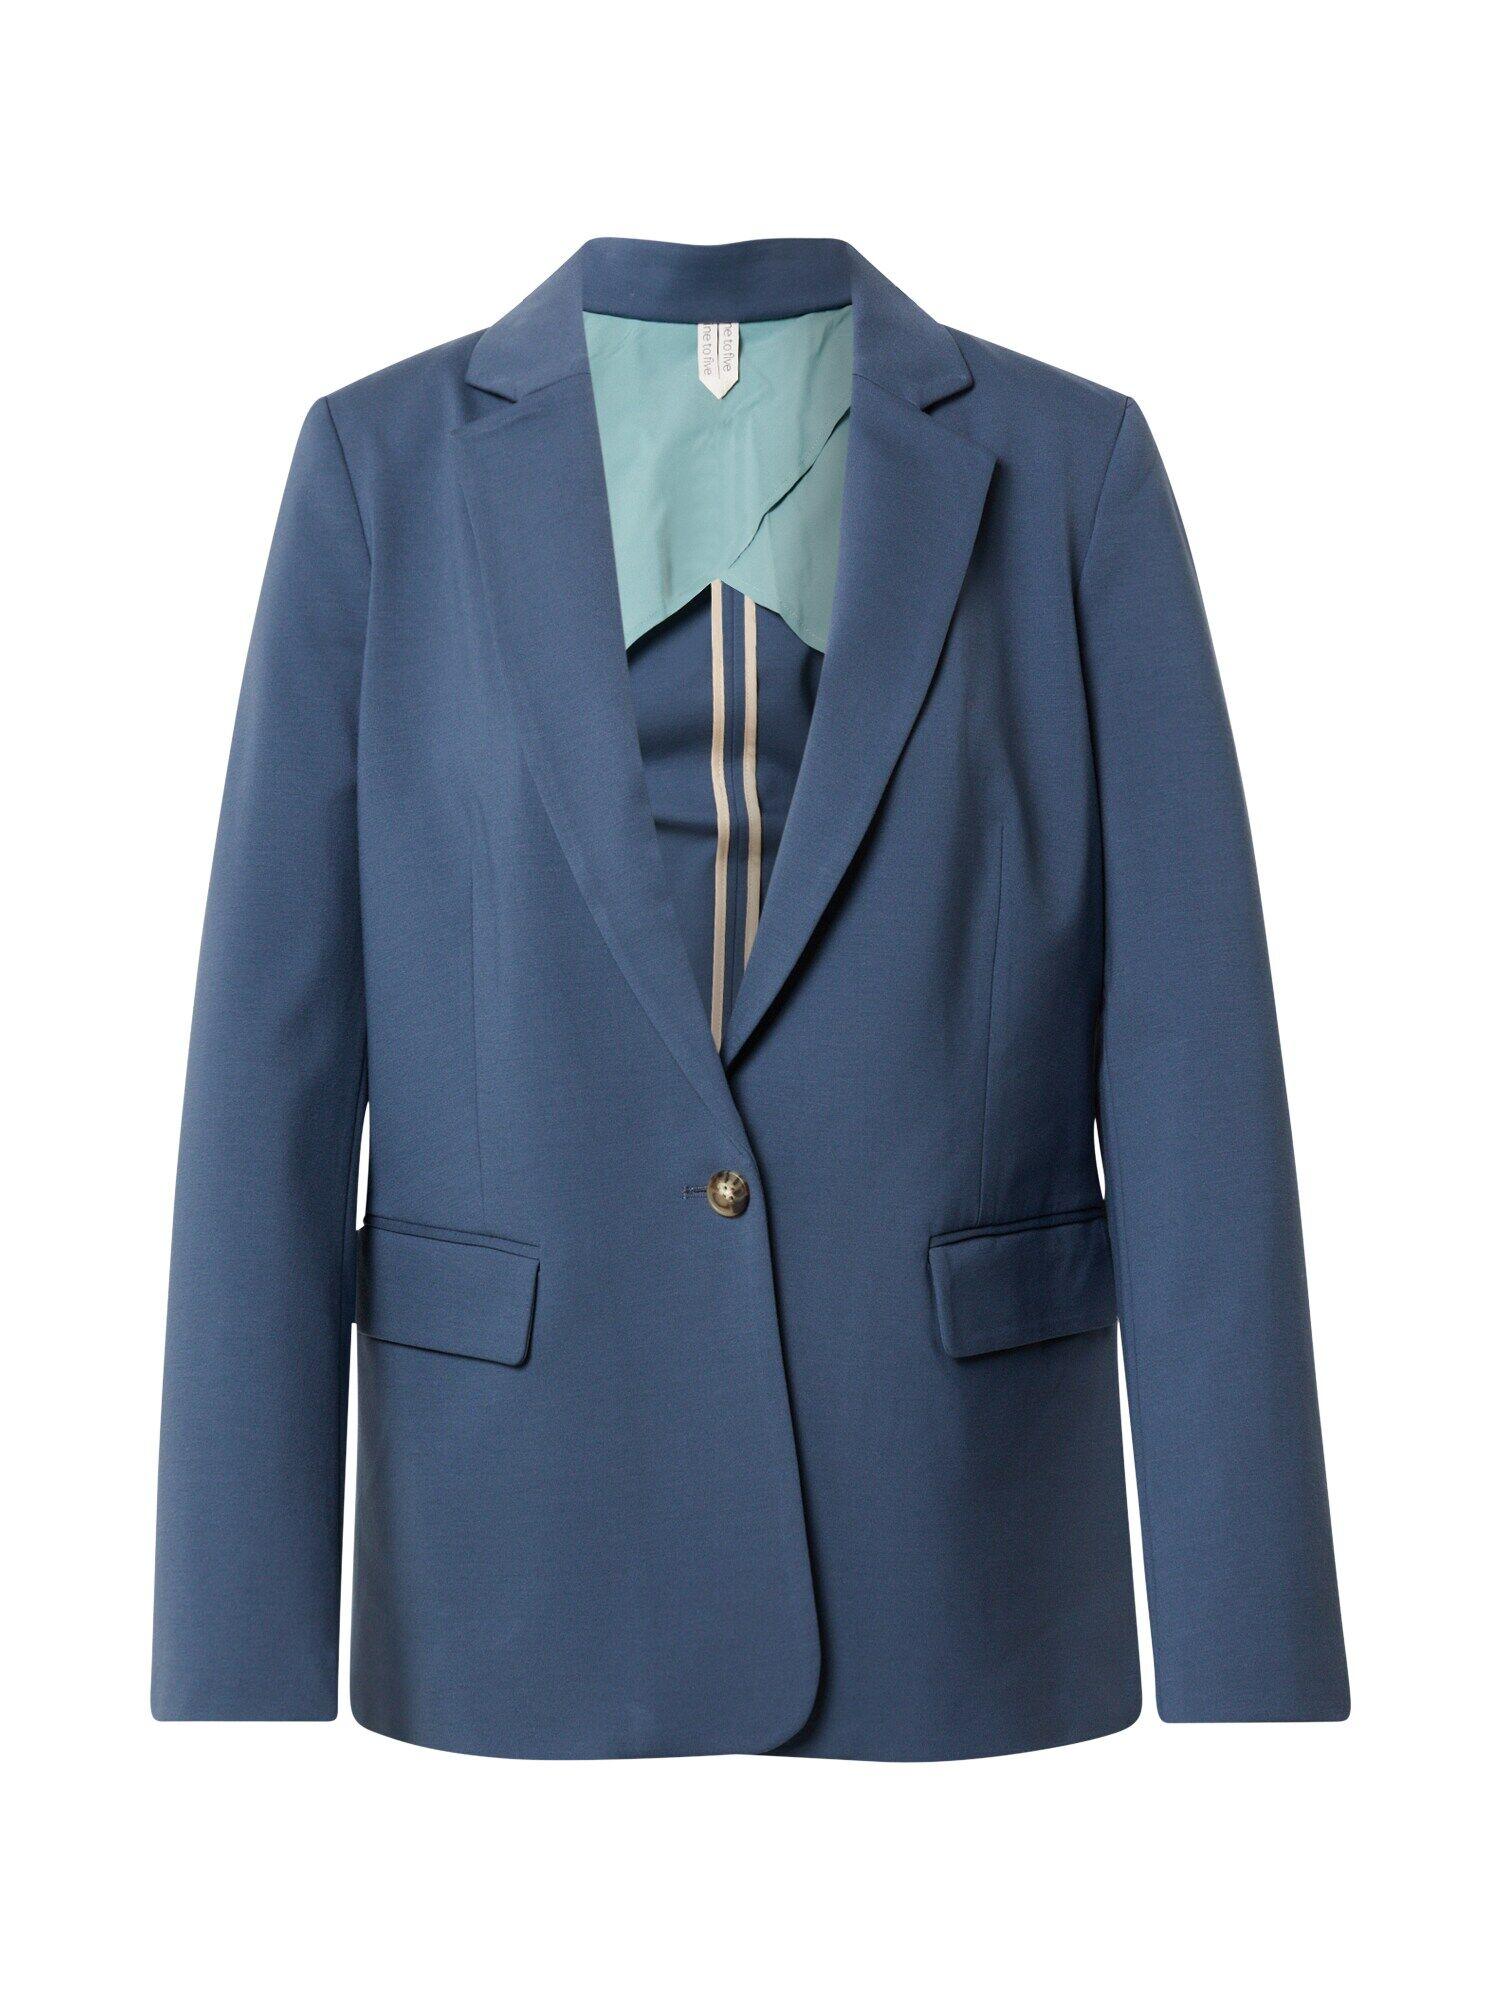 MINE TO FIVE Blazer  - Bleu - Taille: 40 - female